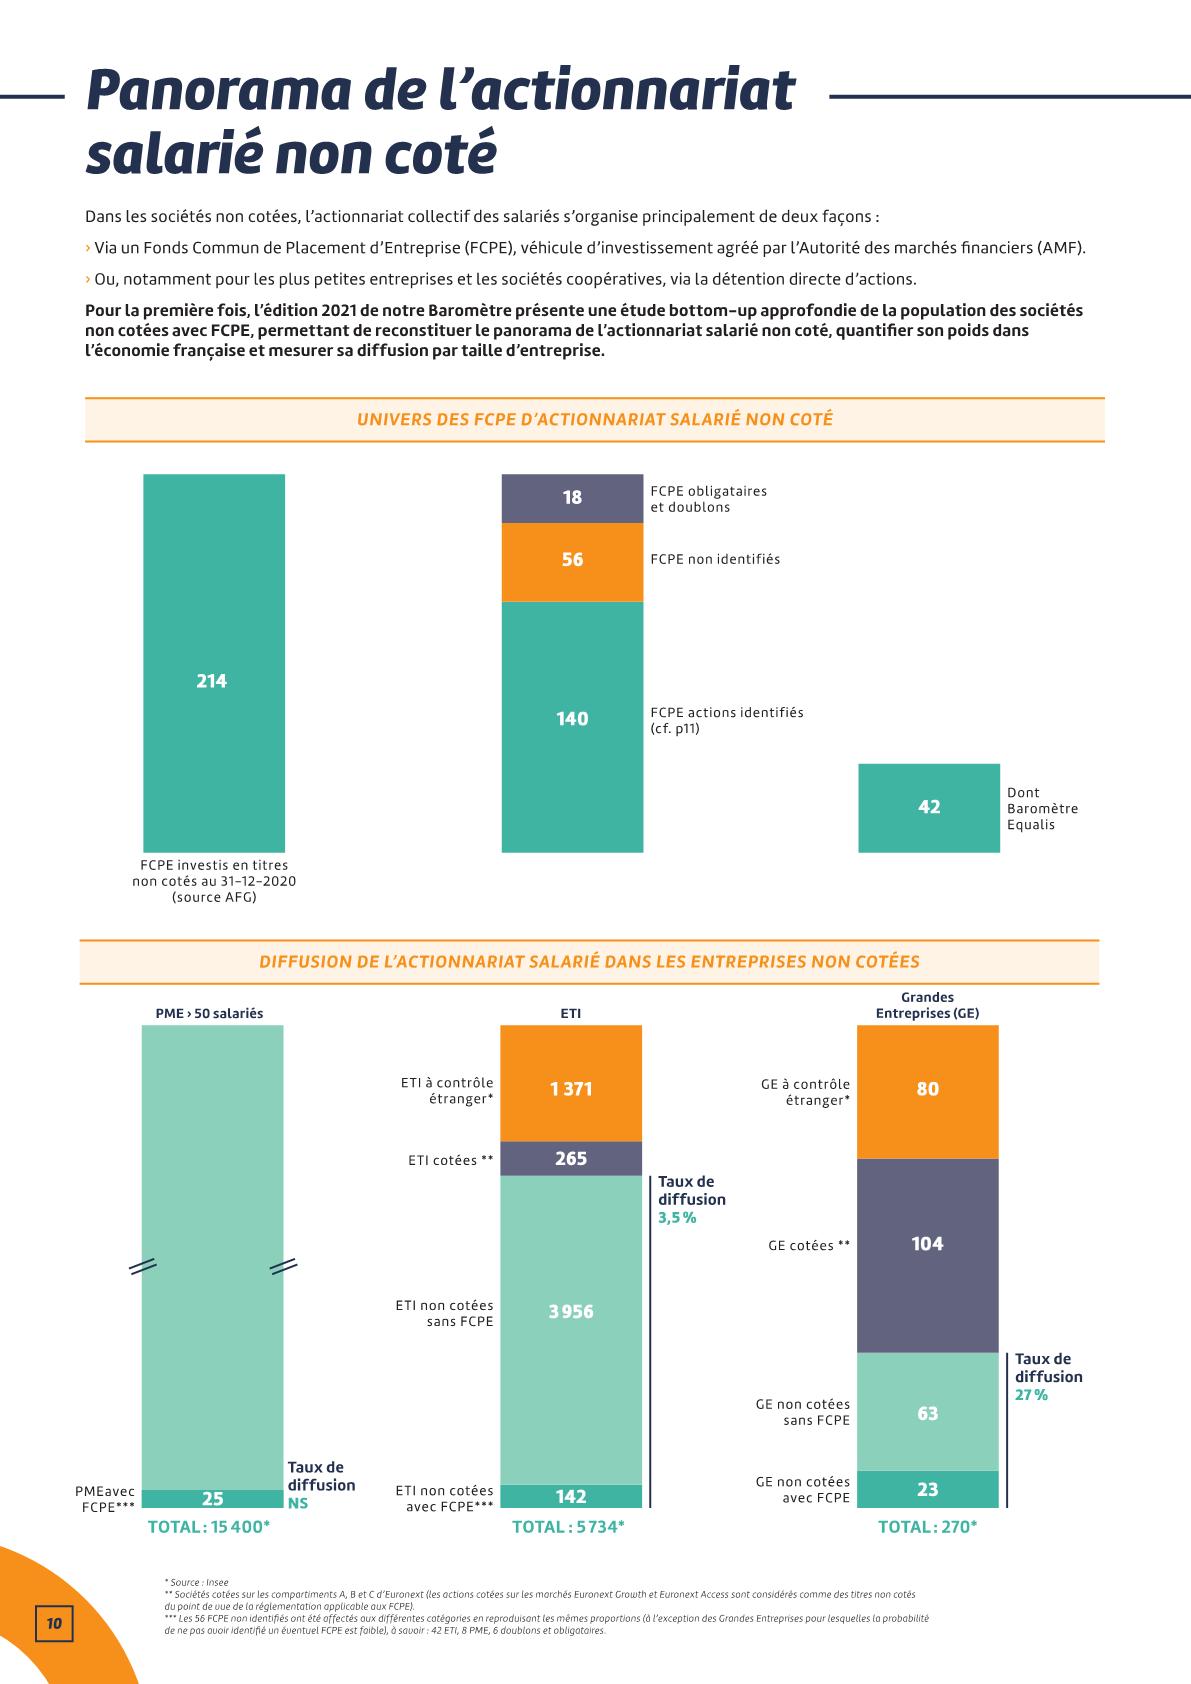 Baromètre_Equalis_Rapport_2021_web10